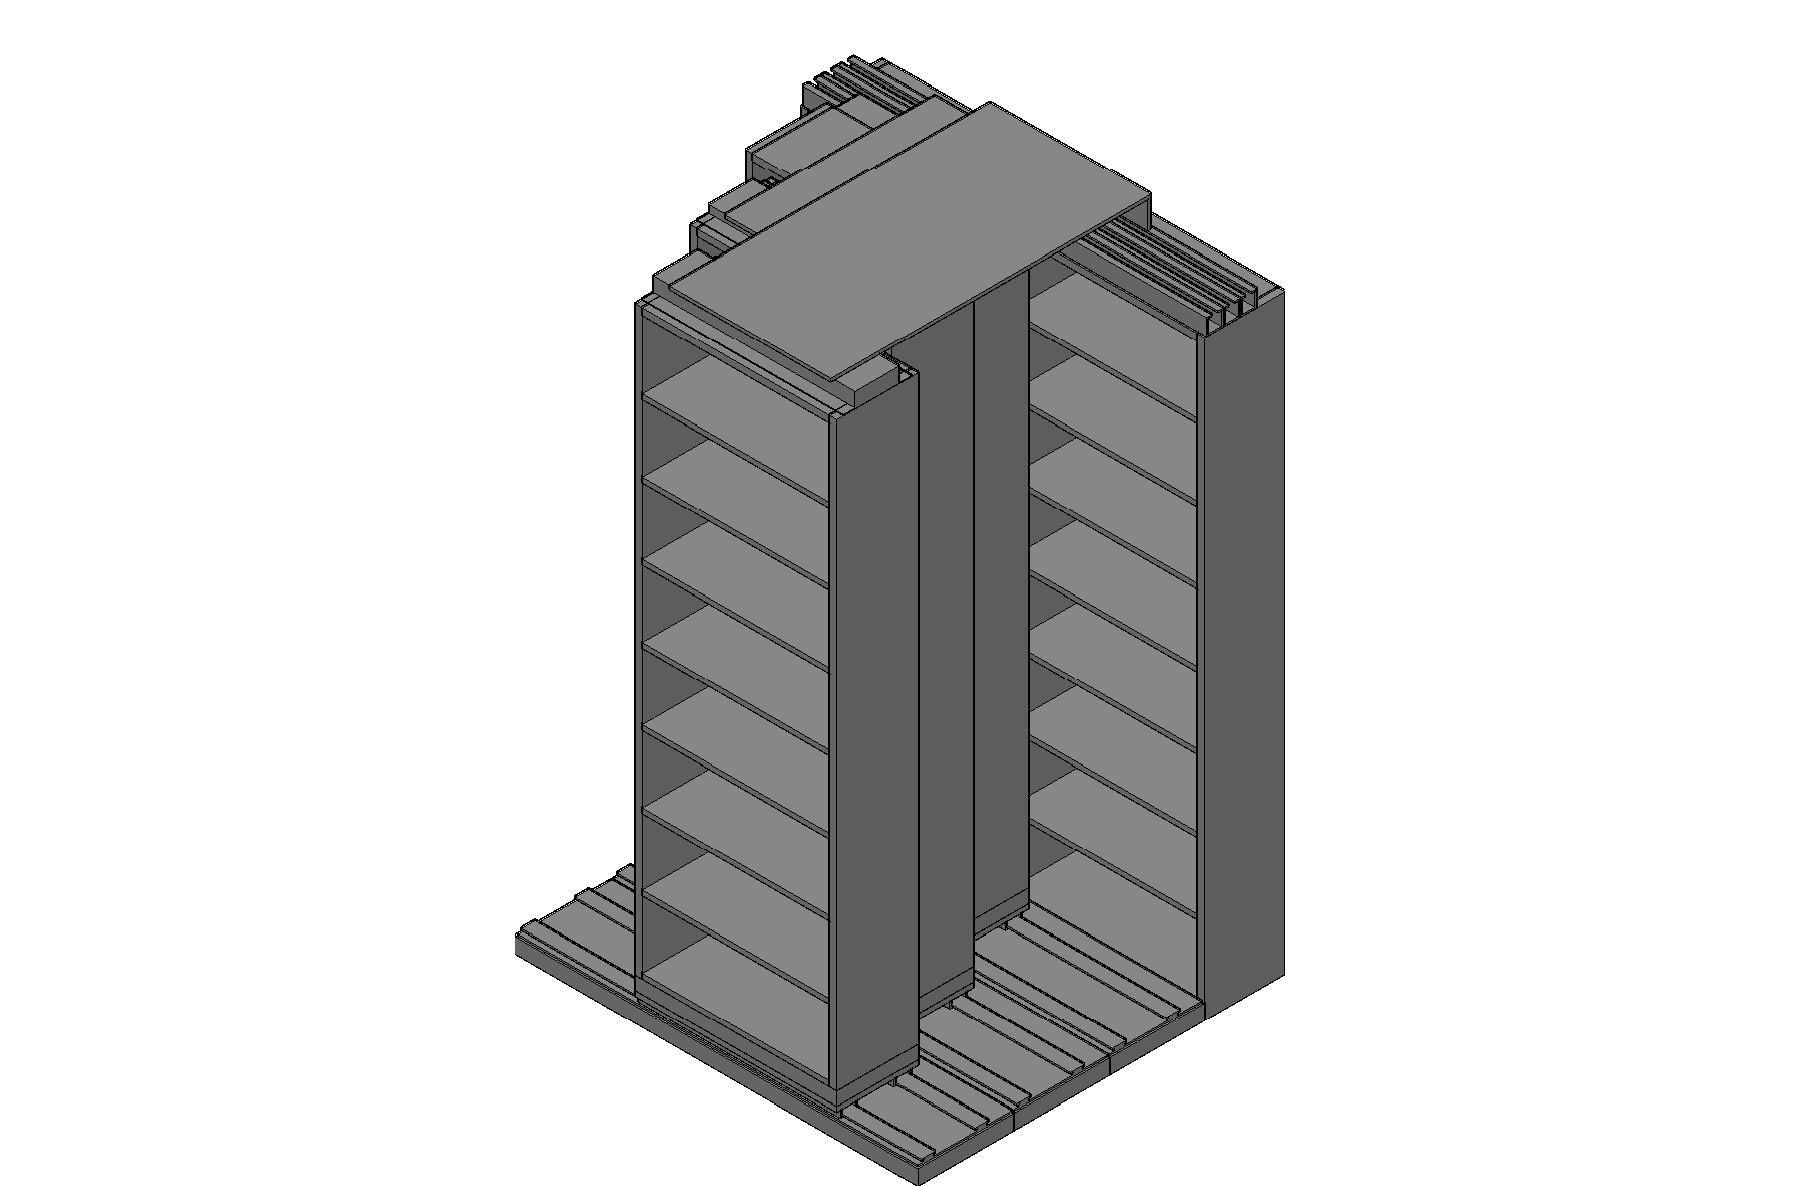 "Letter Size Sliding Shelves - 4 Rows Deep - 8 Levels - (30"" x 12"" Shelves) - 64"" Total Width"